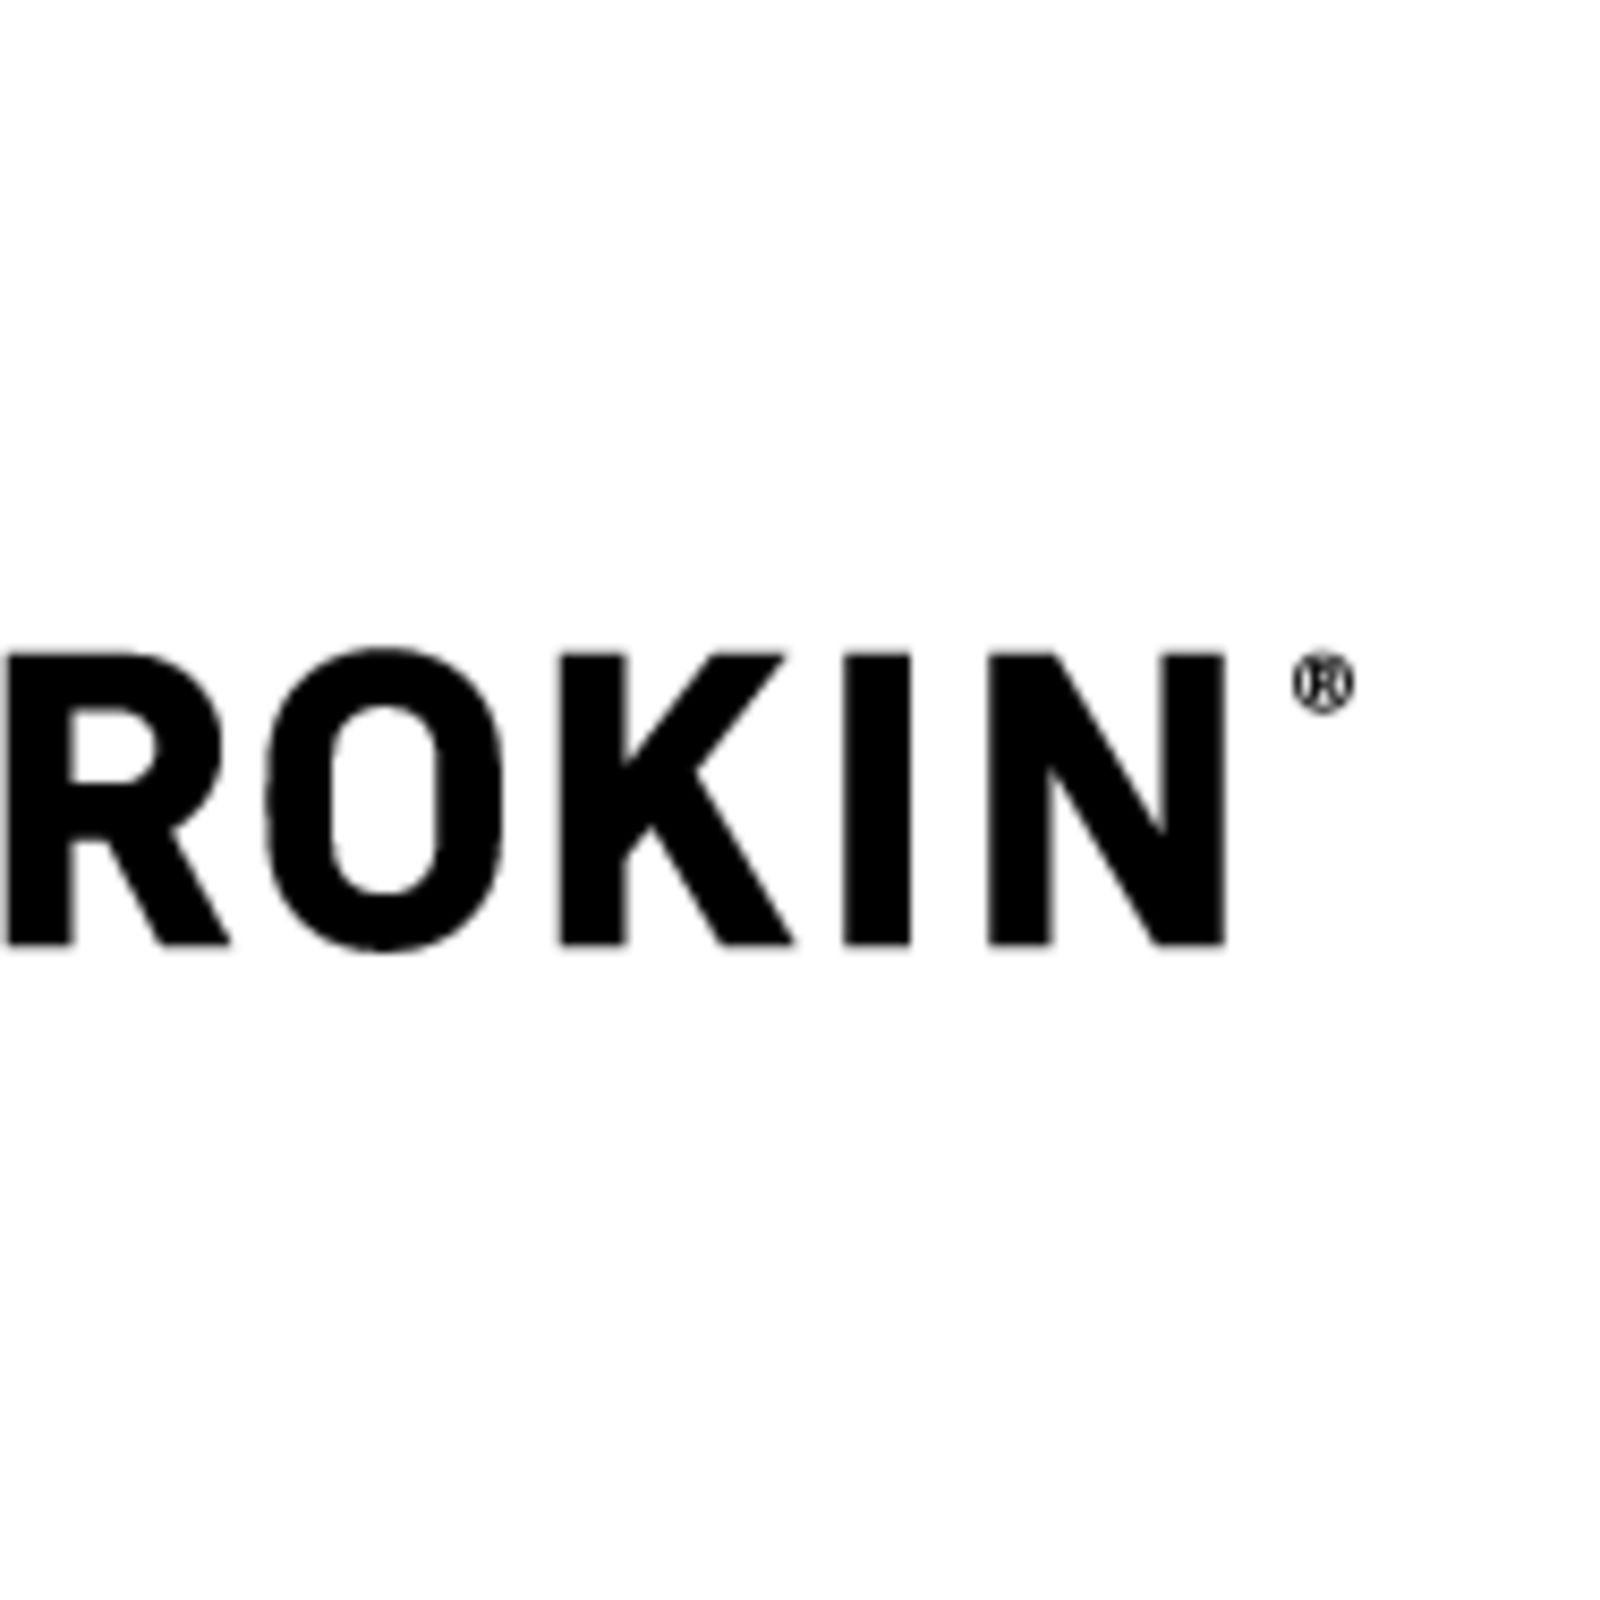 ROKIN (Image 1)